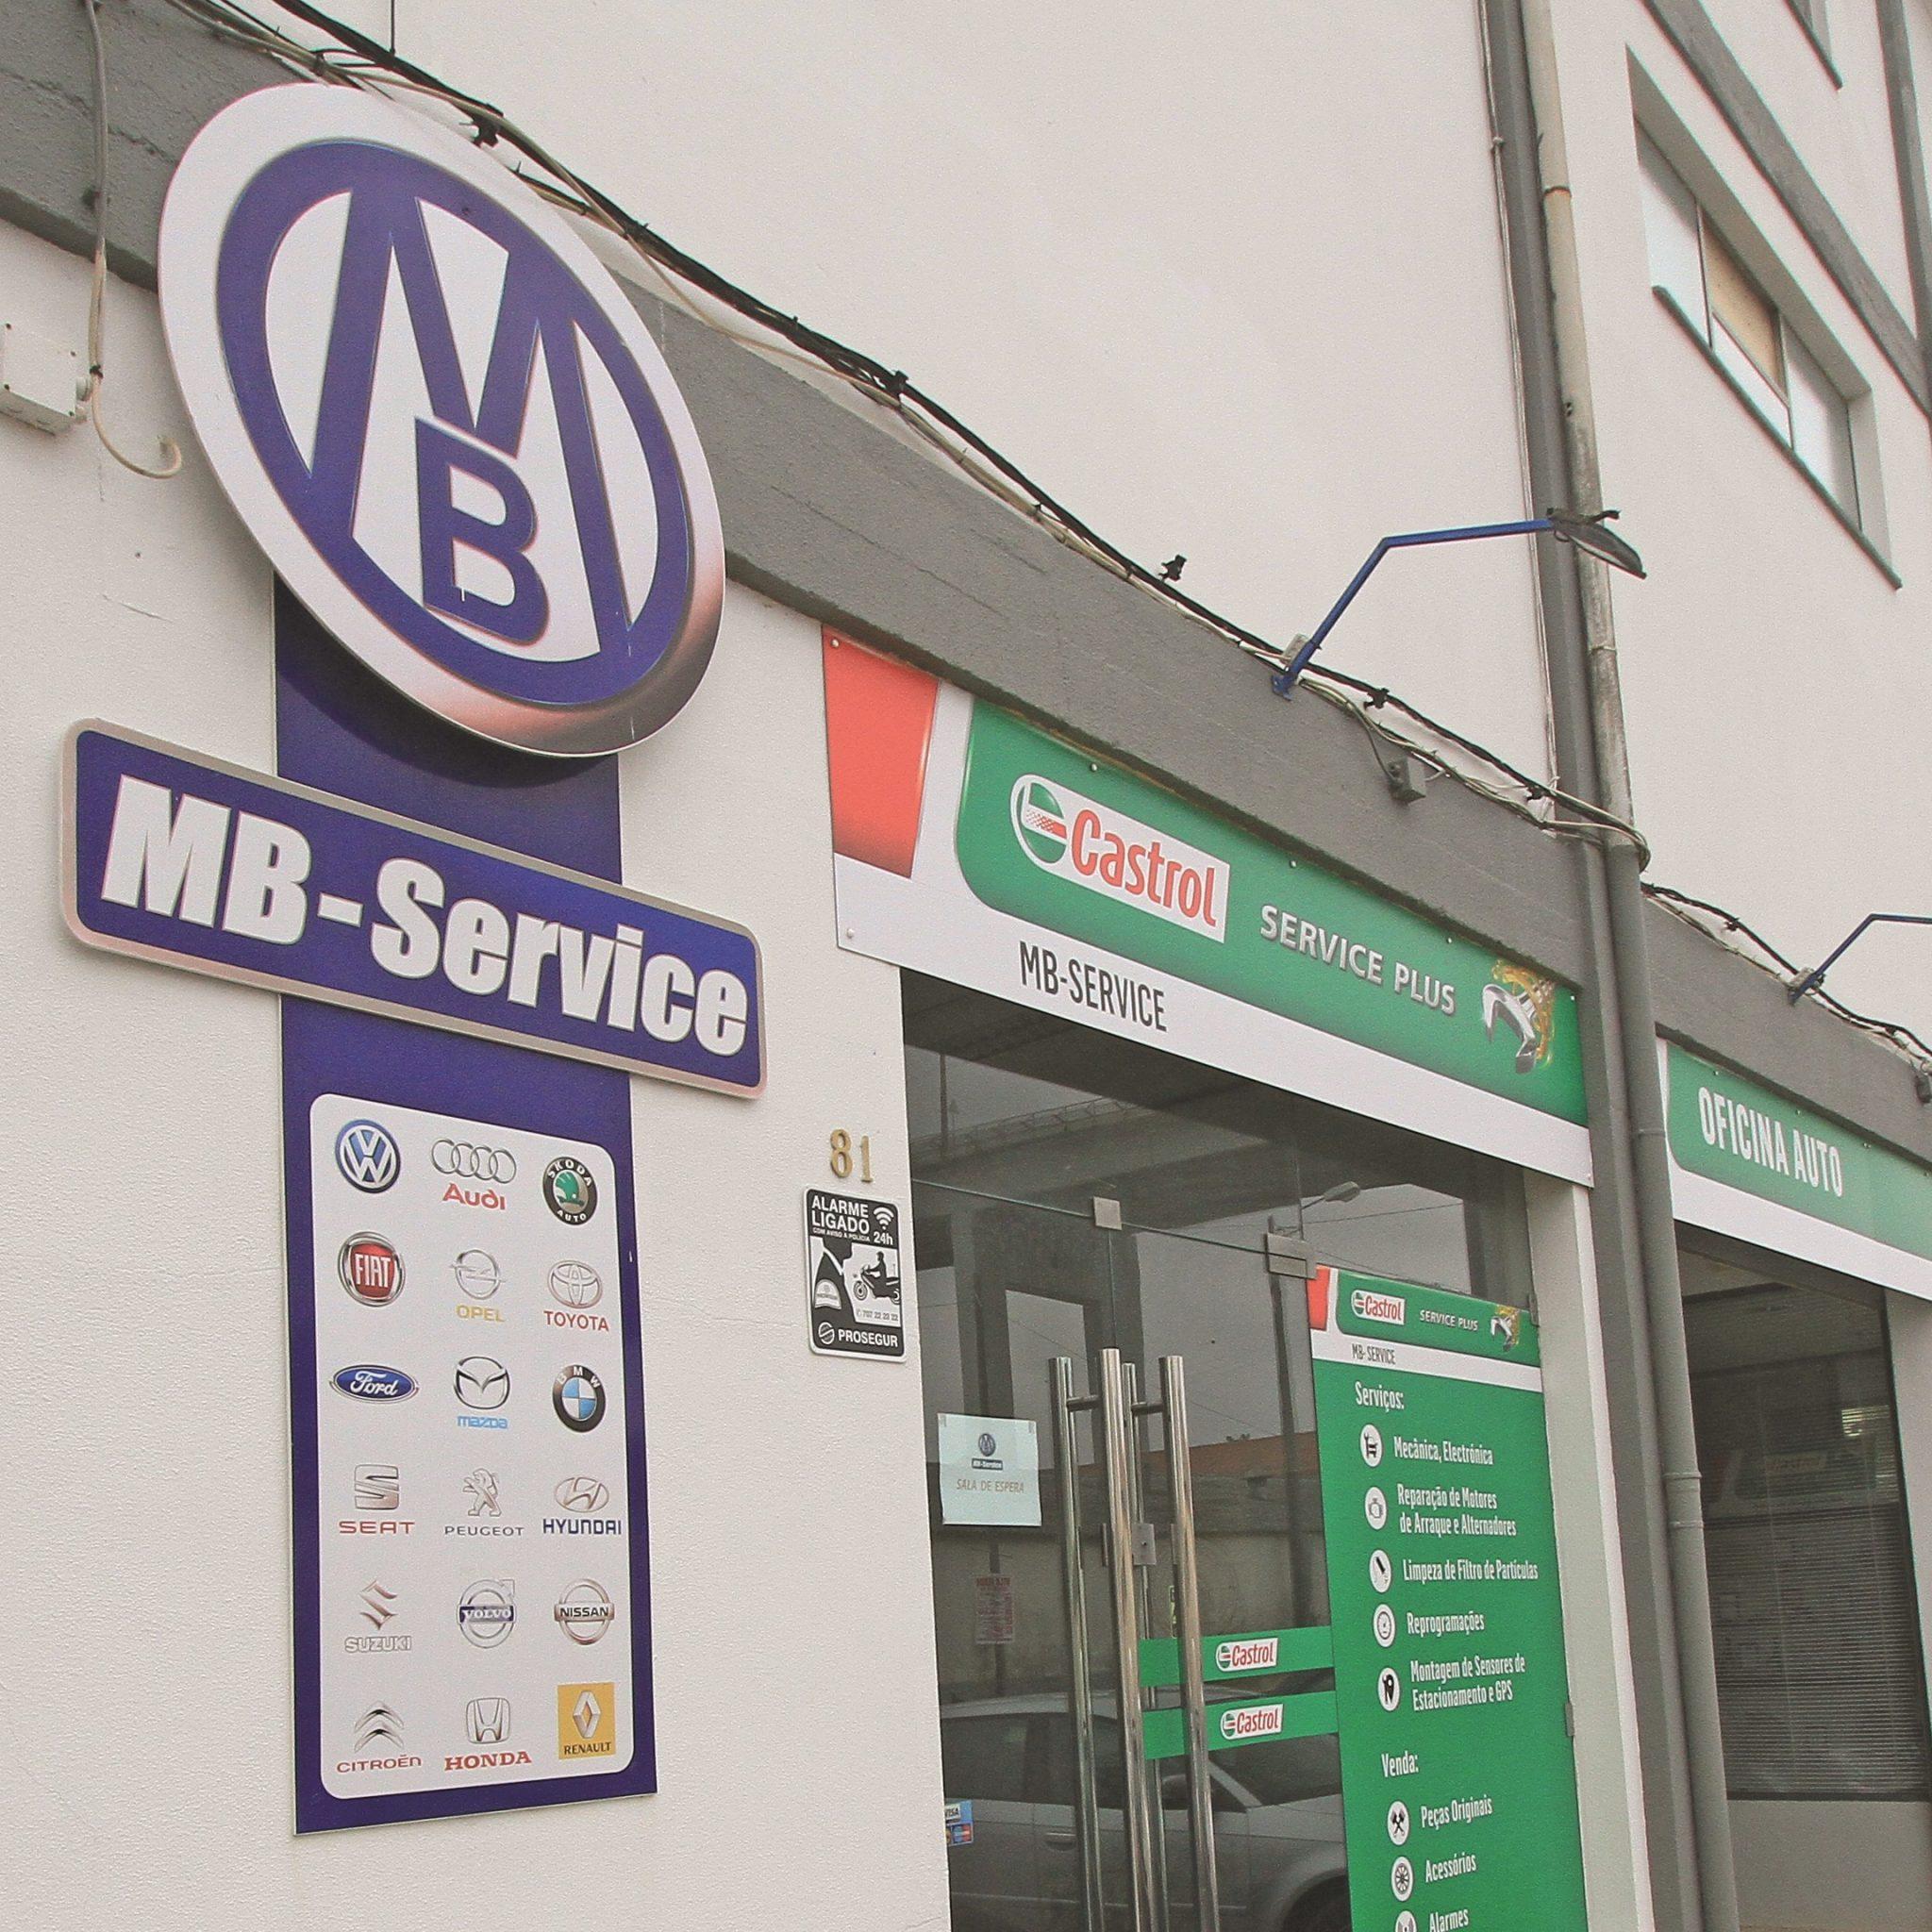 MB-Service